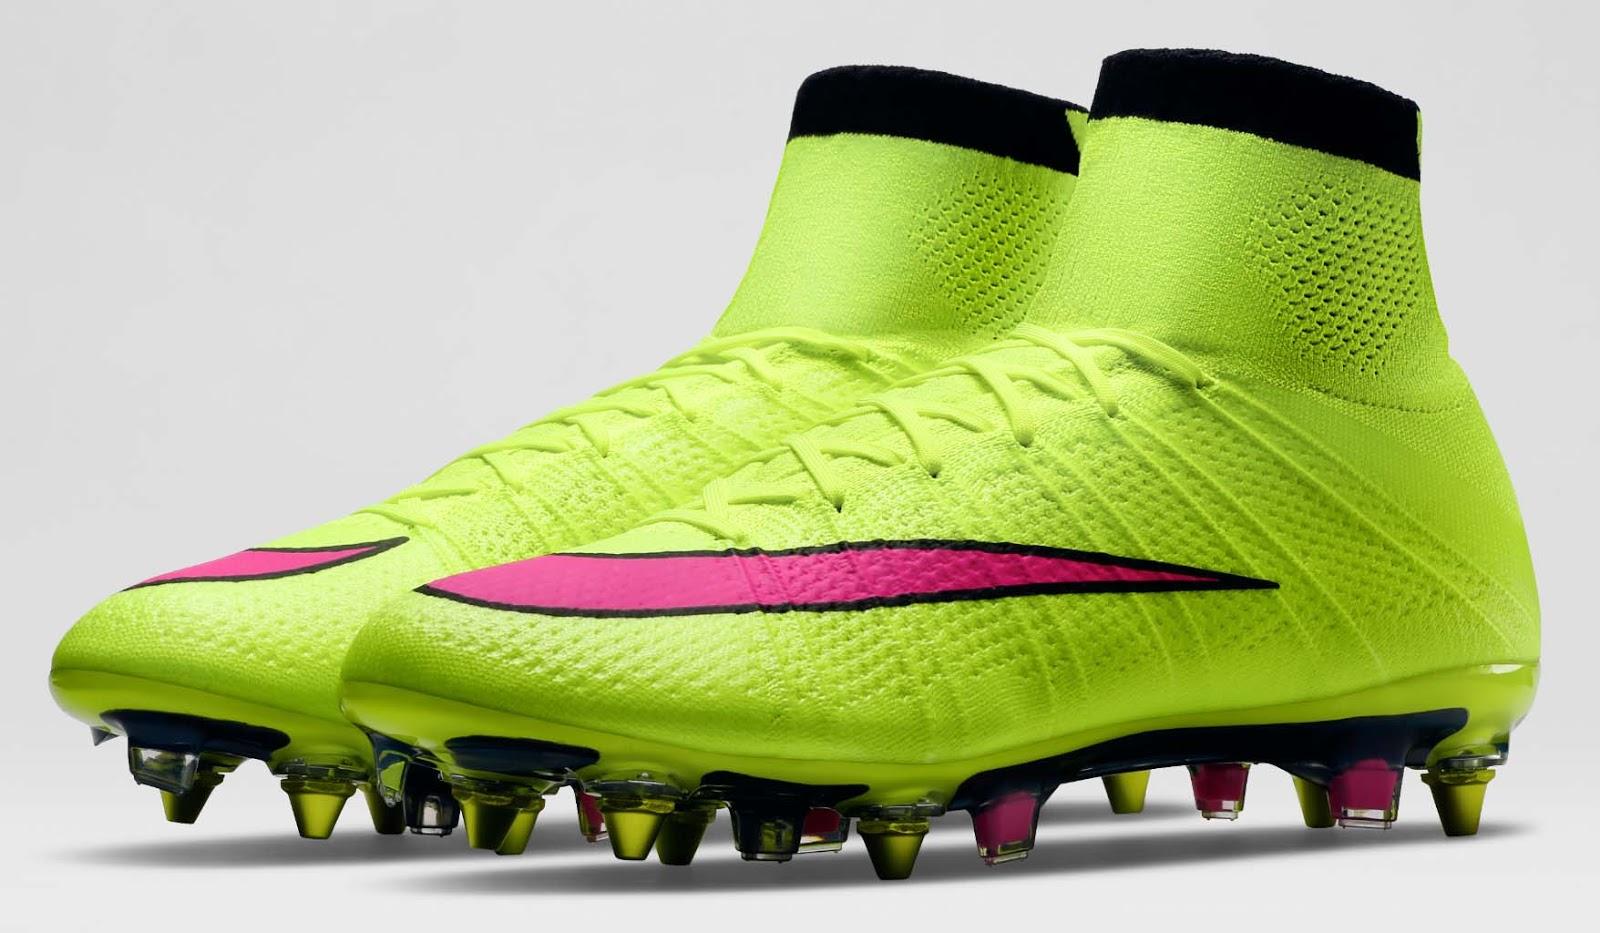 Nike Vapor Soccer Shoes